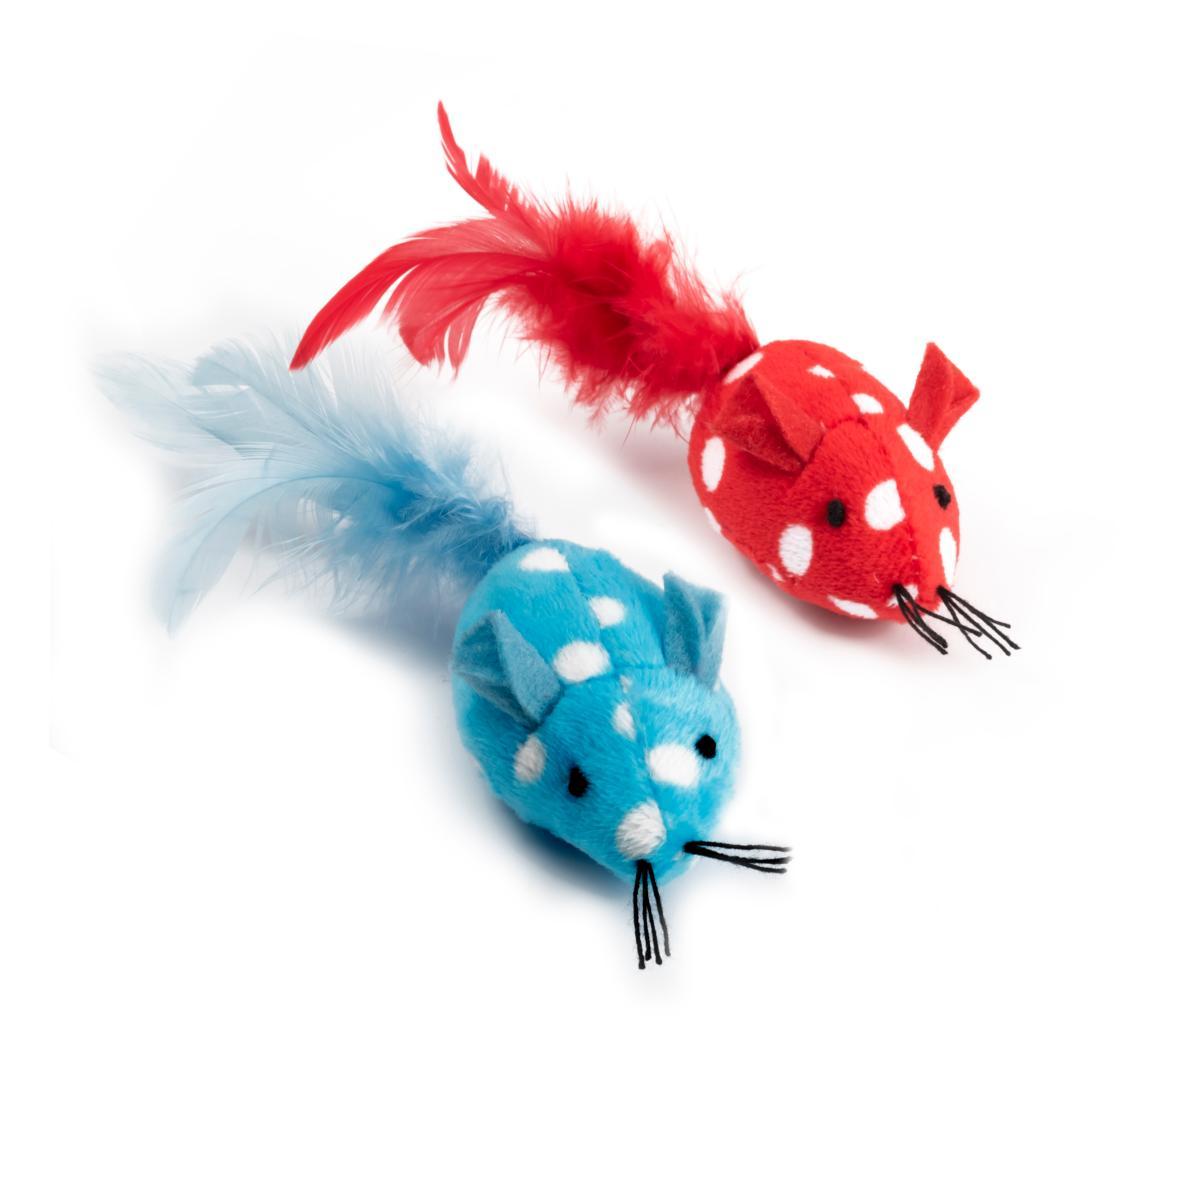 ANCOL Polka Mice with Catnip 13cm 2pcs